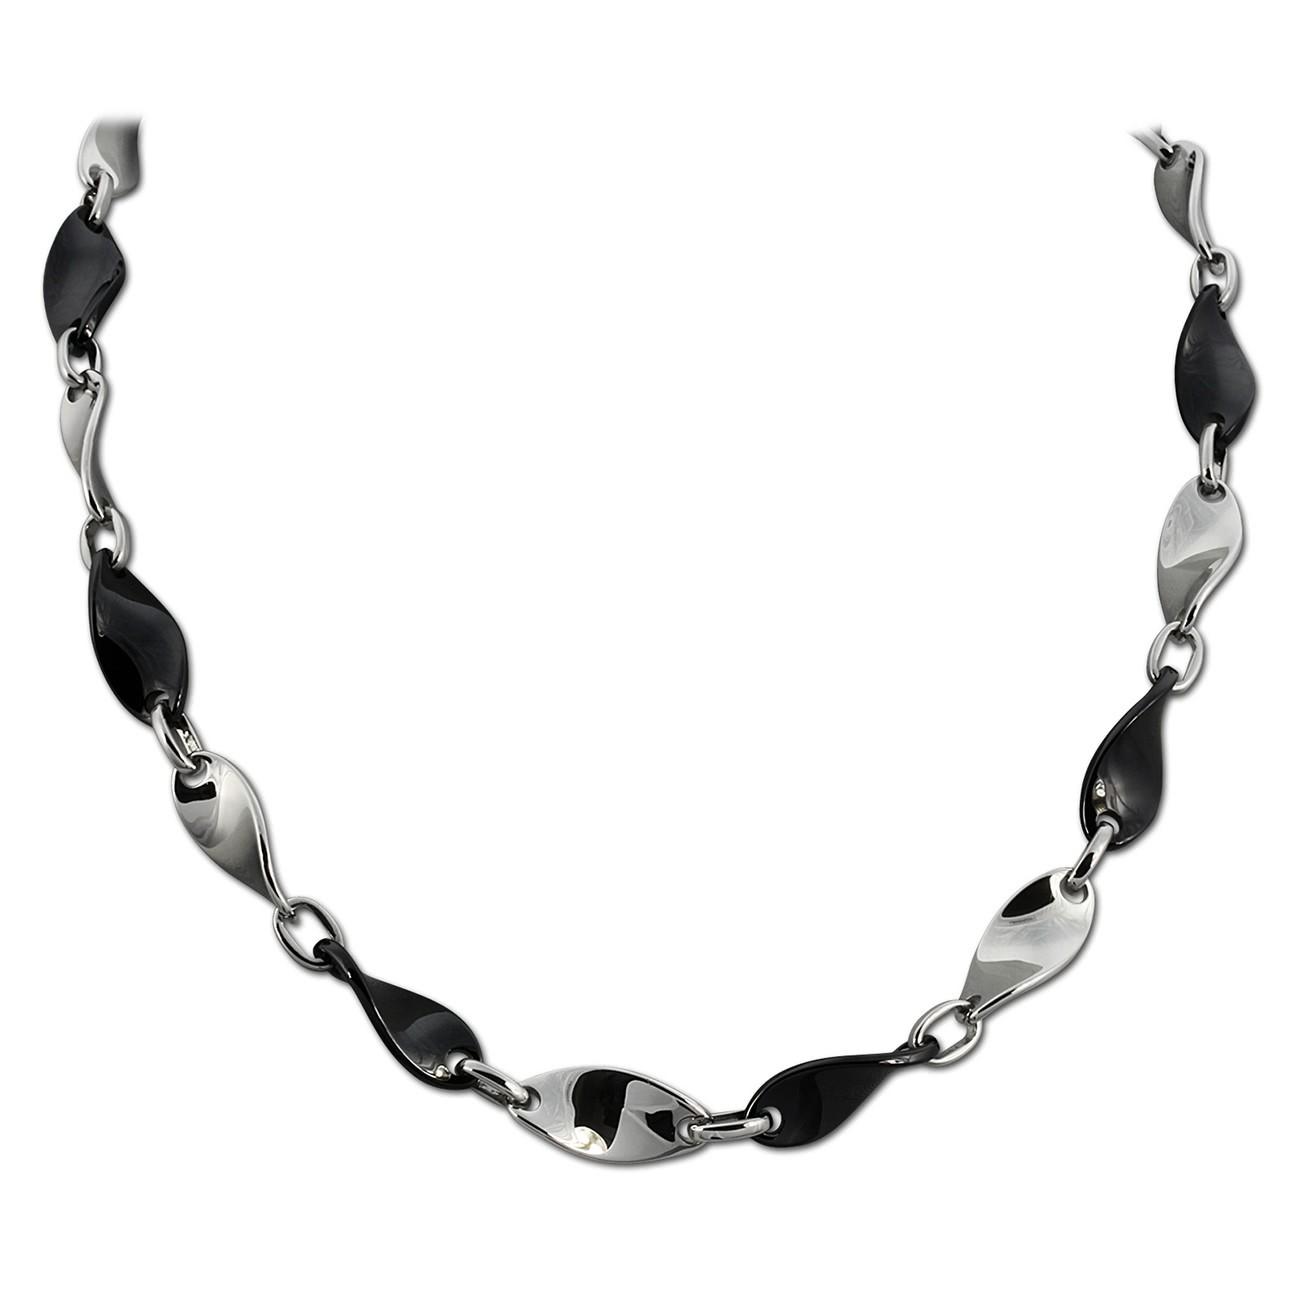 Amello Halskette Keramik Welle schwarz Damen Edelstahlschmuck ESKX08S